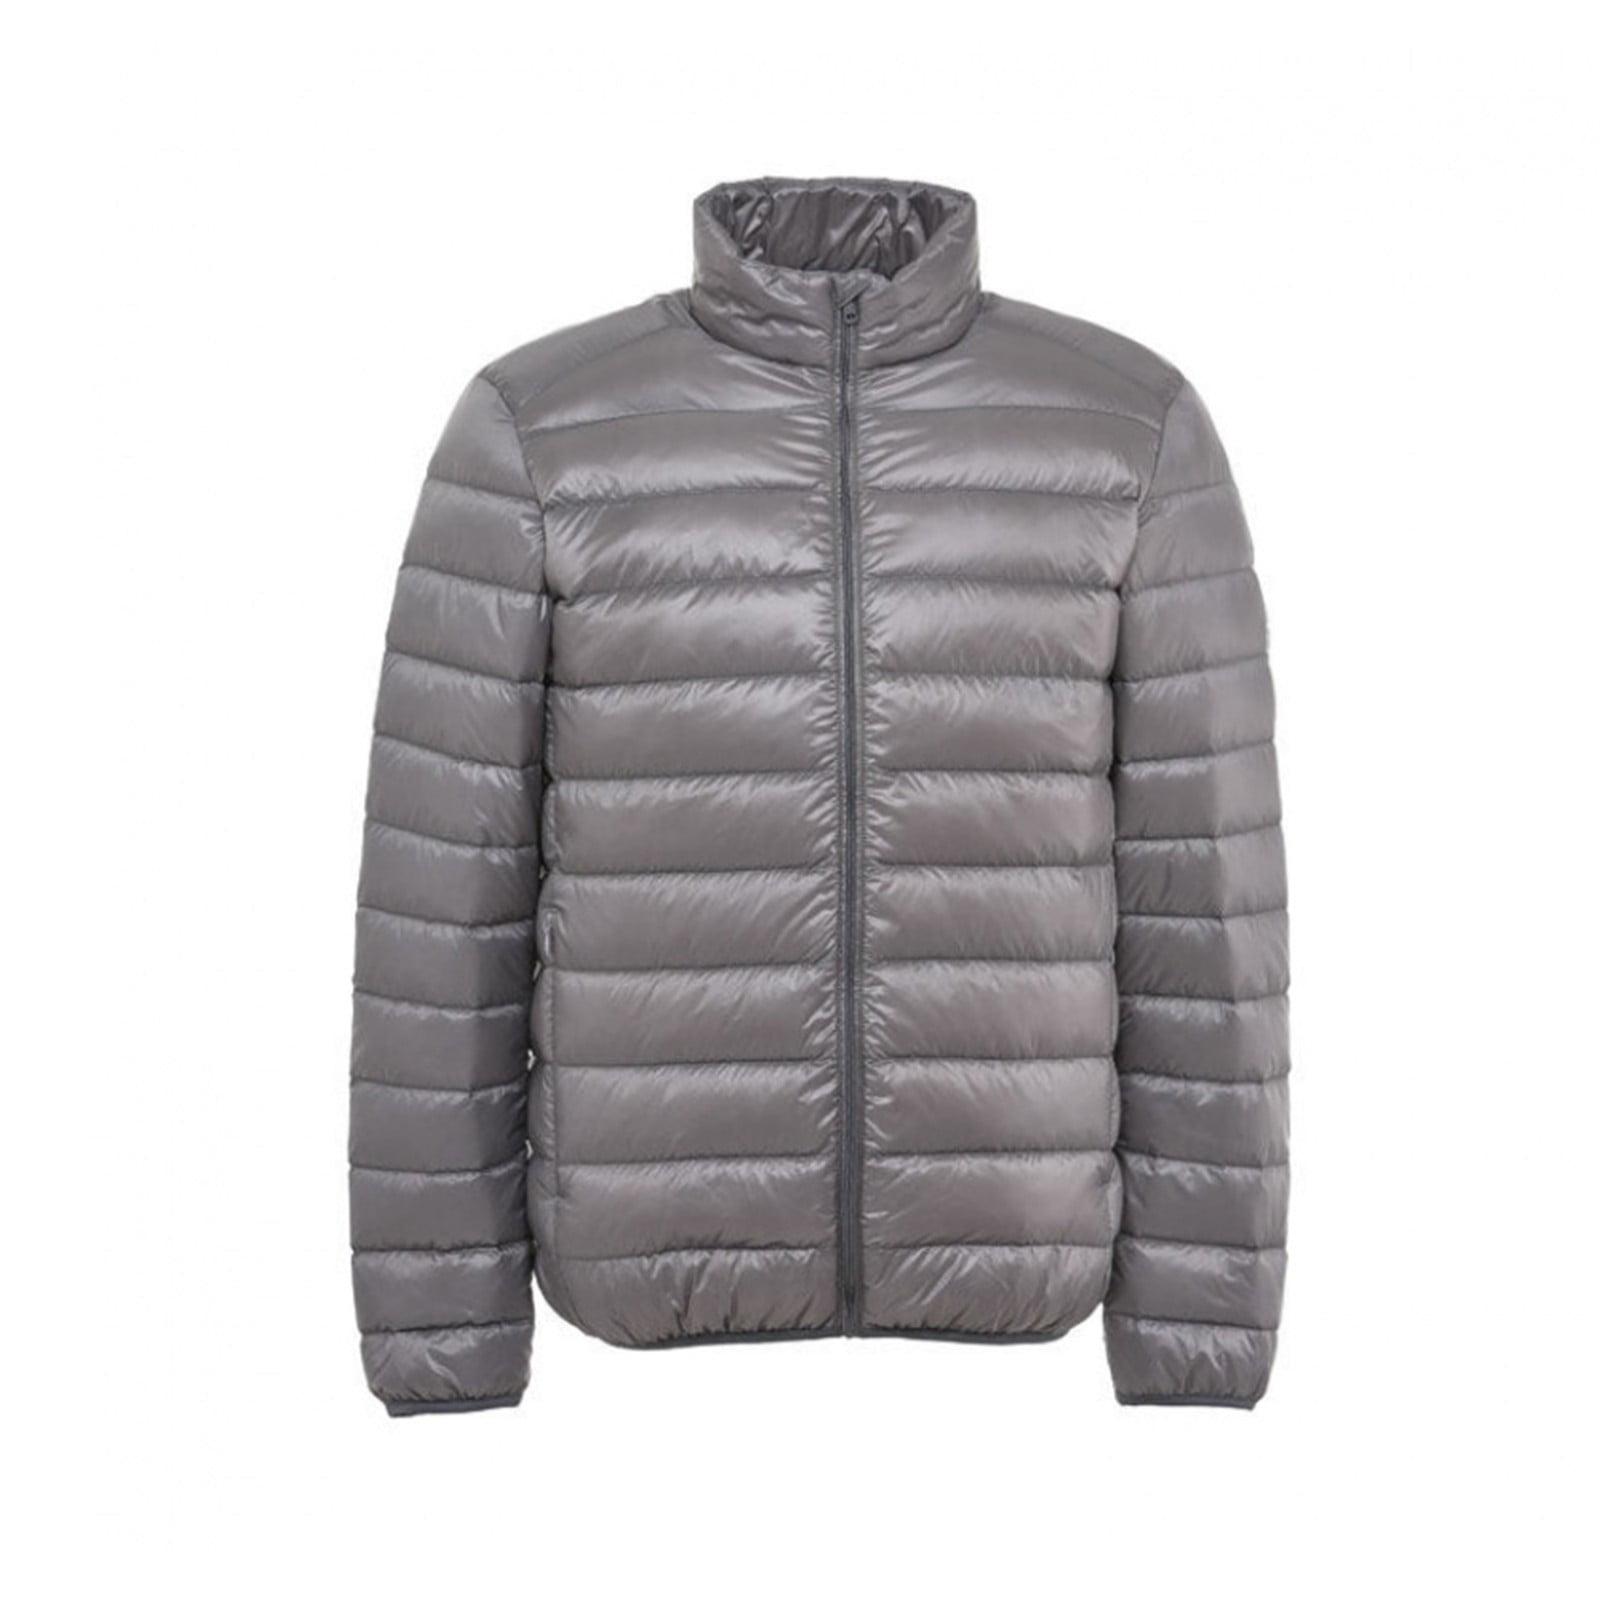 Men/'s Ultralight Hooded Duck Down Jacket Puffer Winter Coat Packable Outerwear